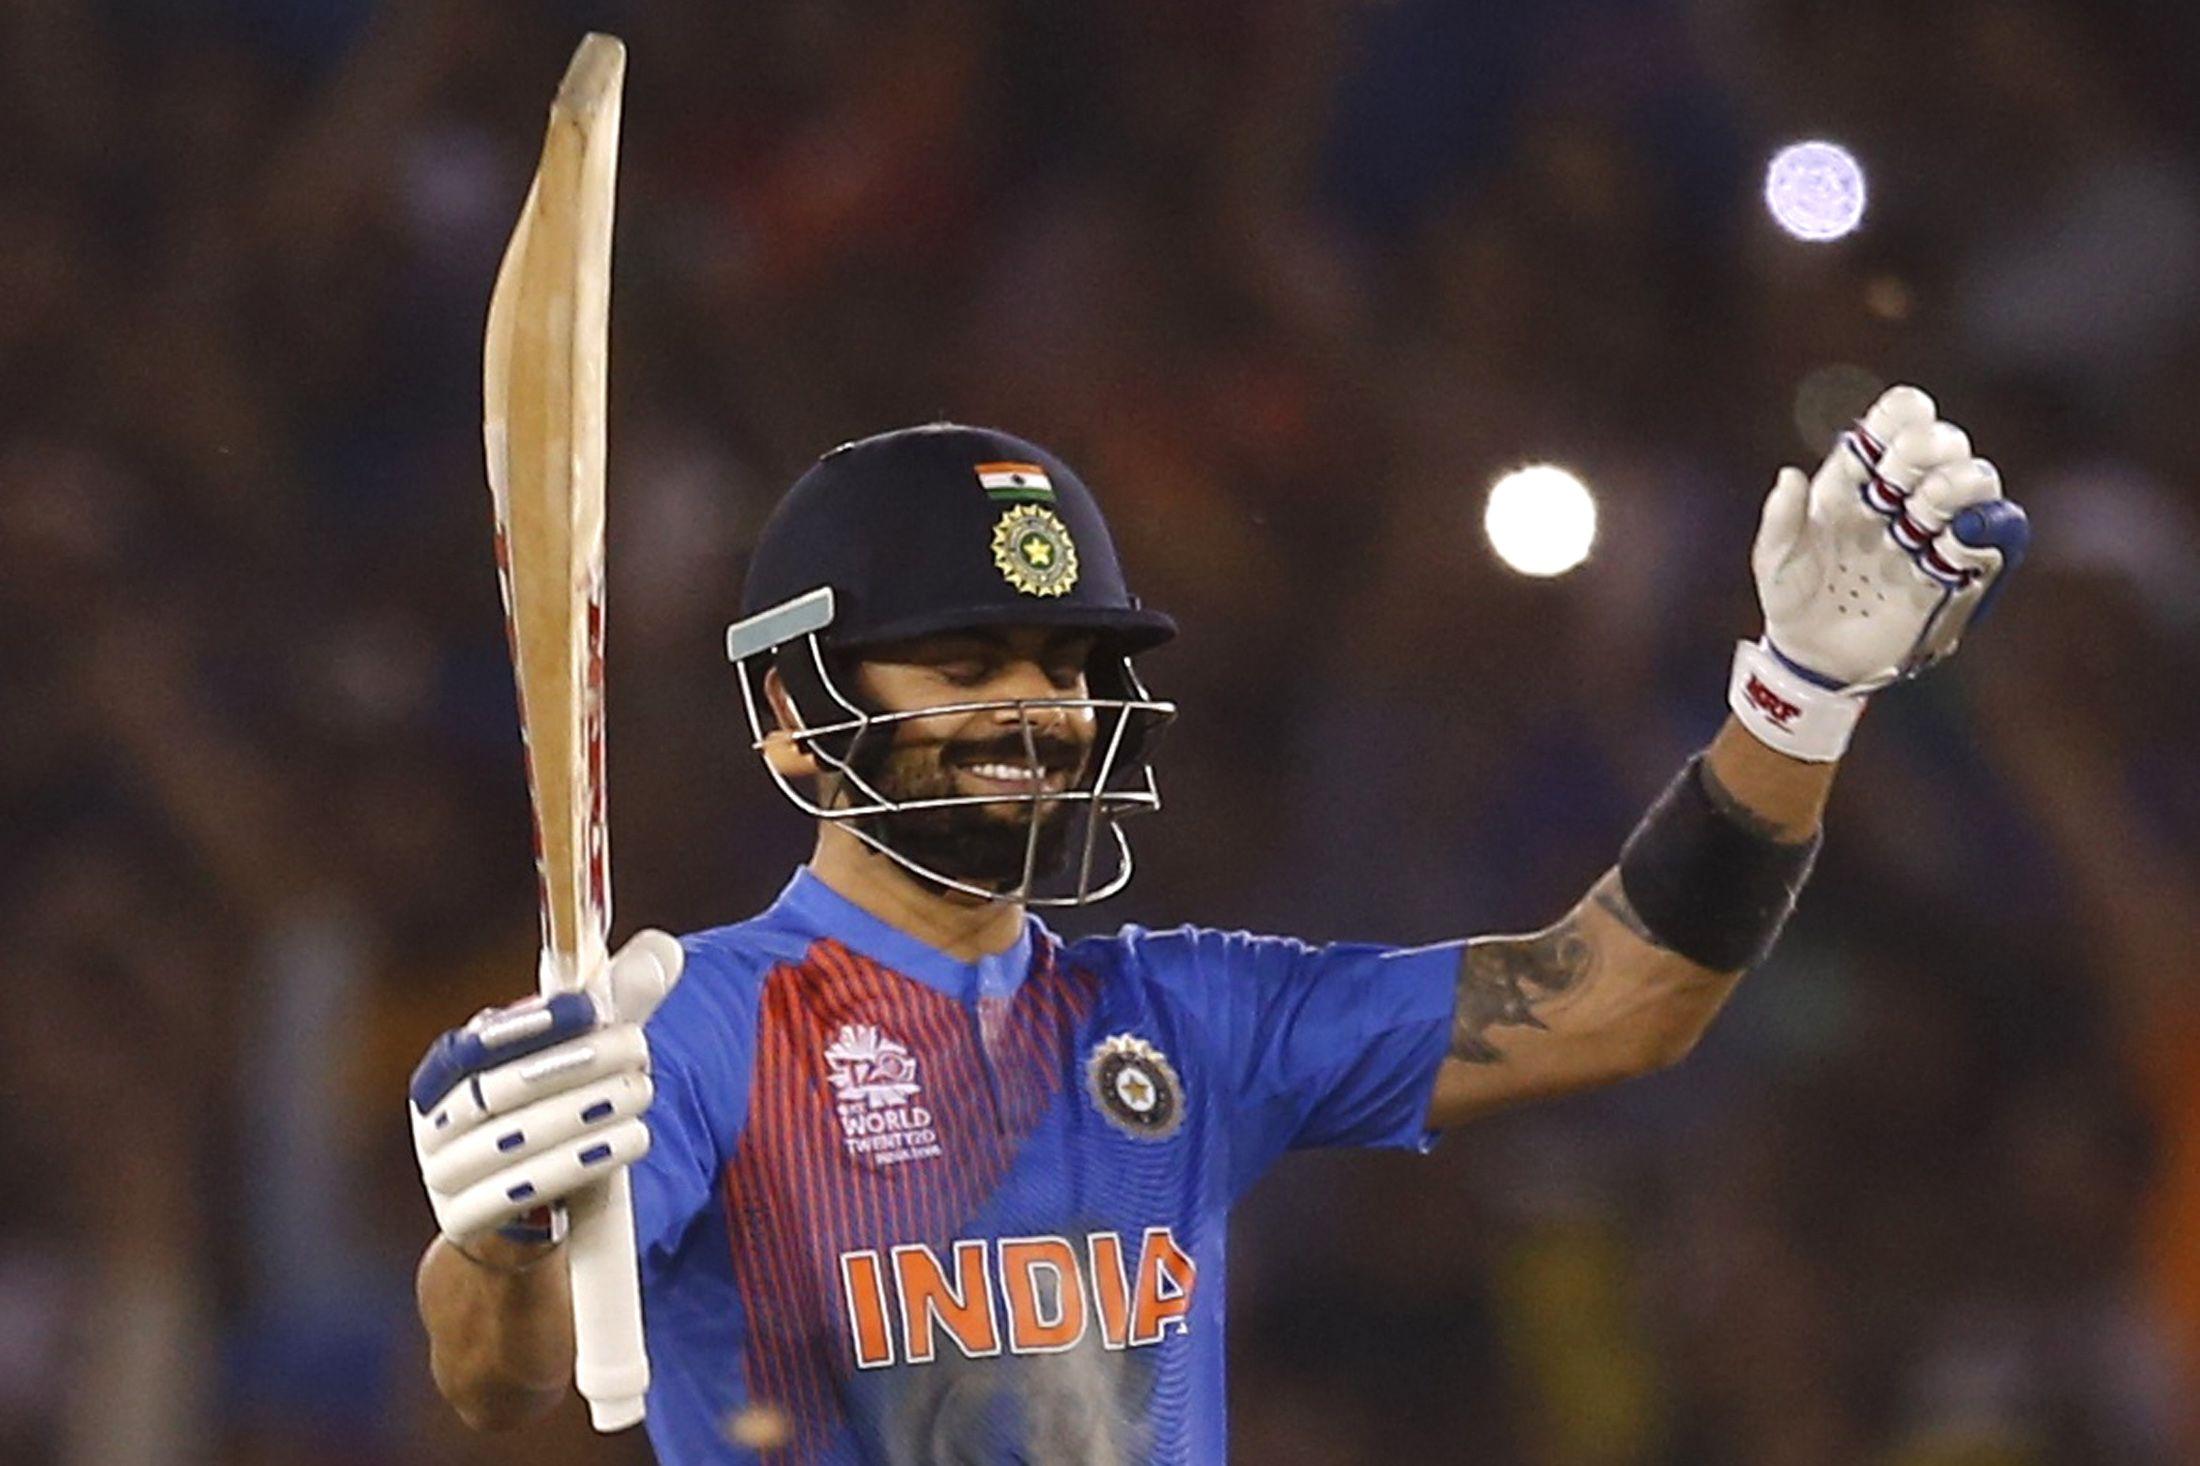 Virat Kohli struck a brilliant 82 not out for India against Australia on Sunday.